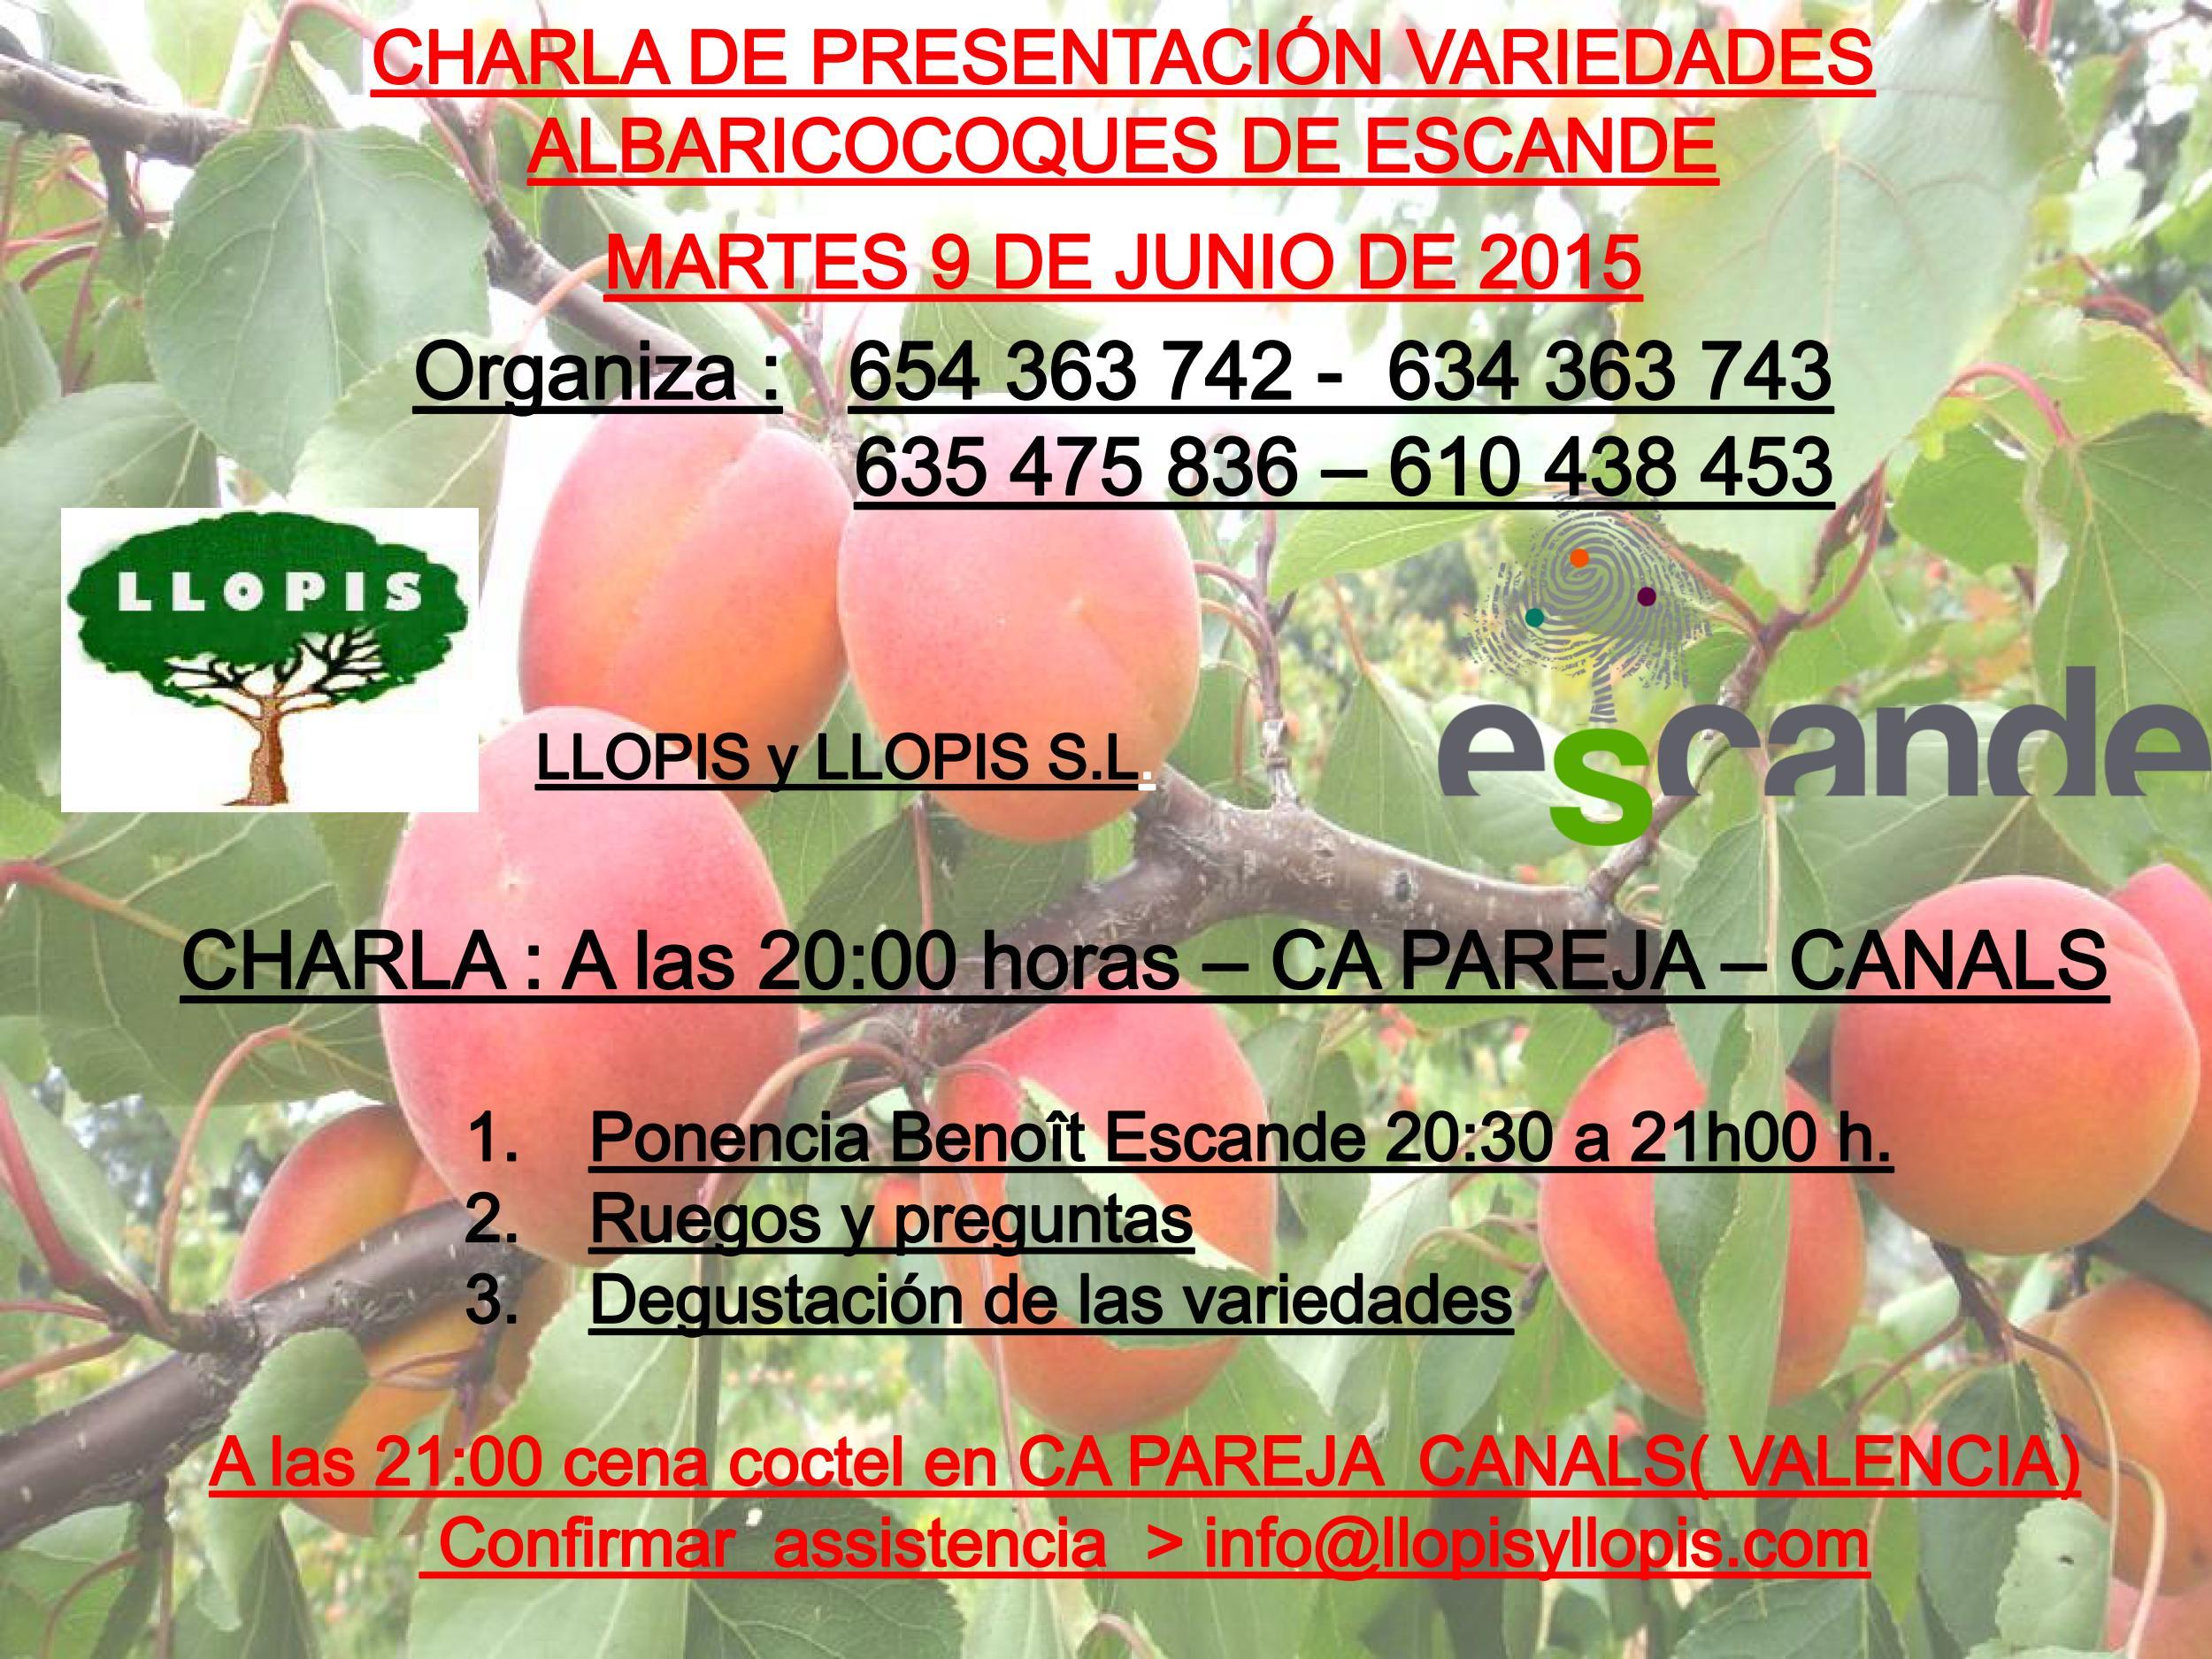 Invitation CHARLA